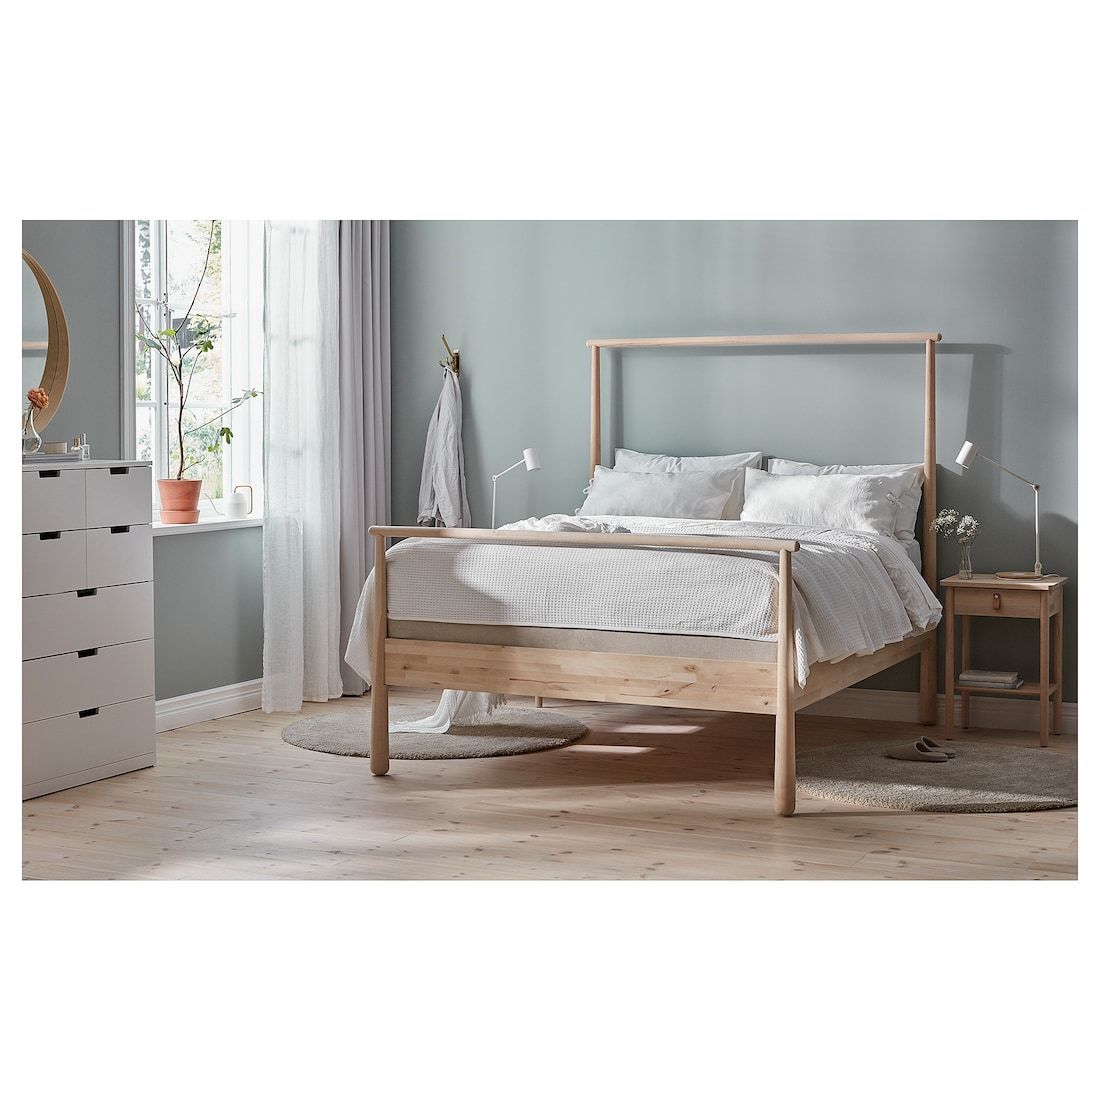 Gjora Bed Frame Birch Luroy Queen Light Wood Bed